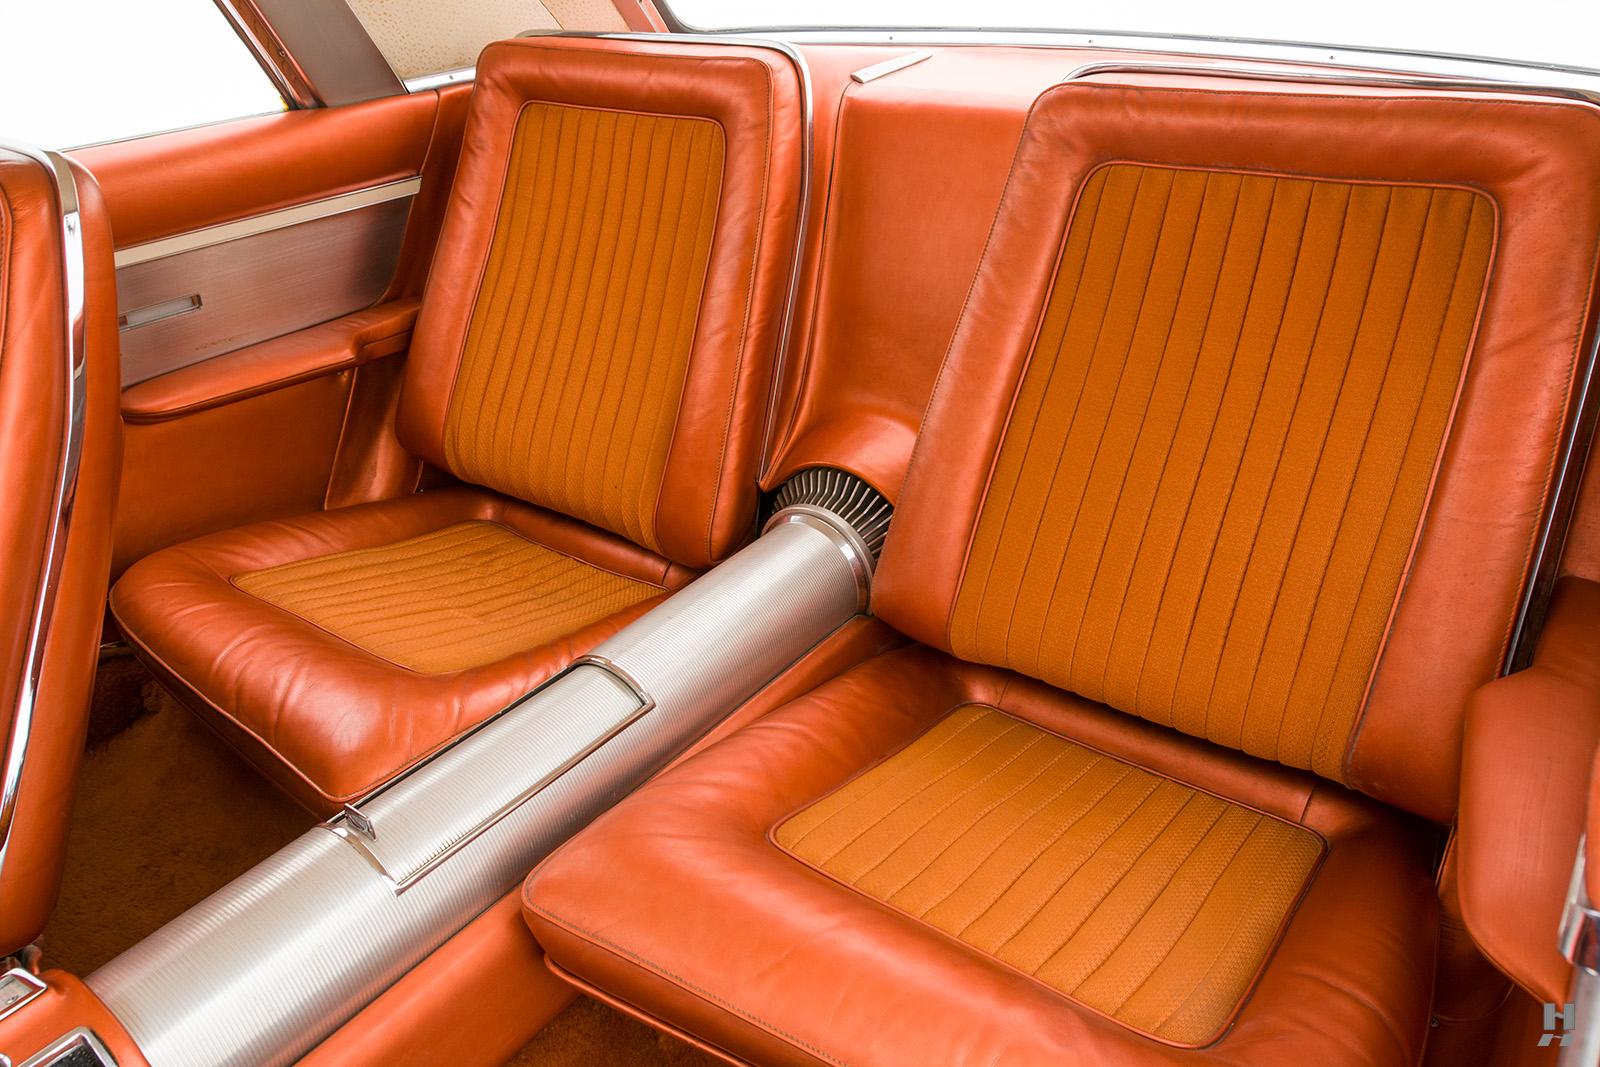 1963 Chrysler Turbine Car interior back seat